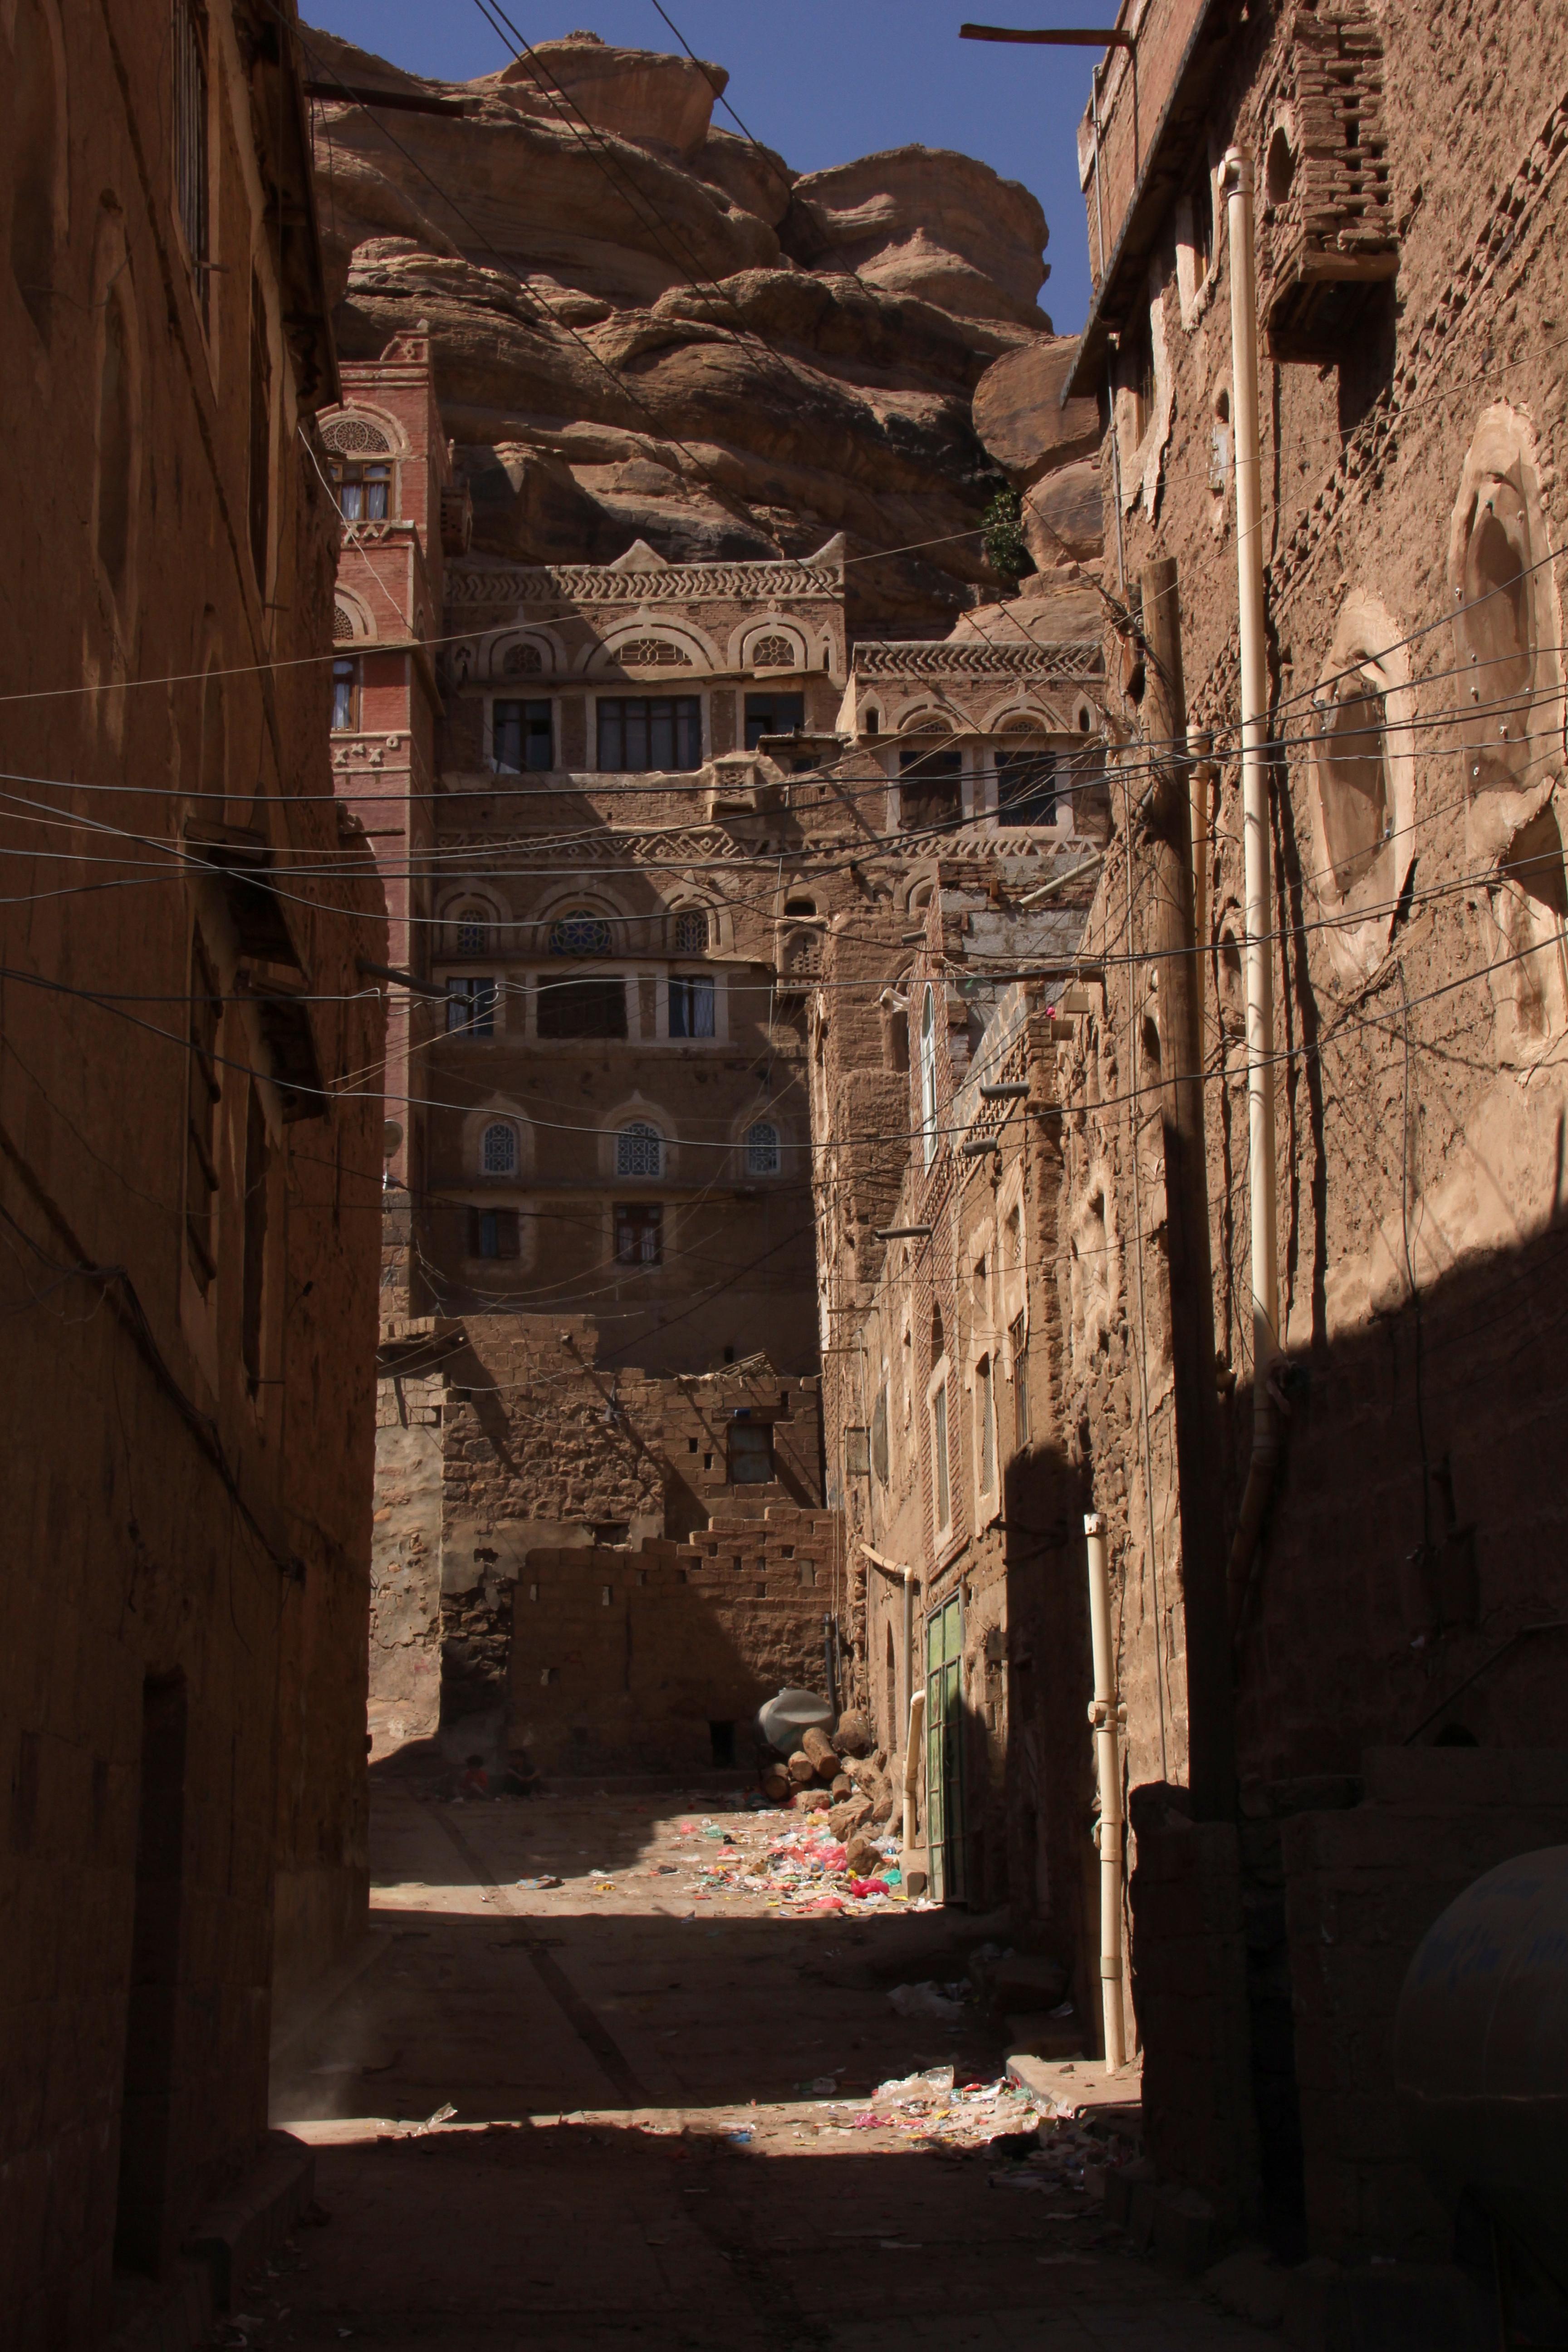 From Sanaa